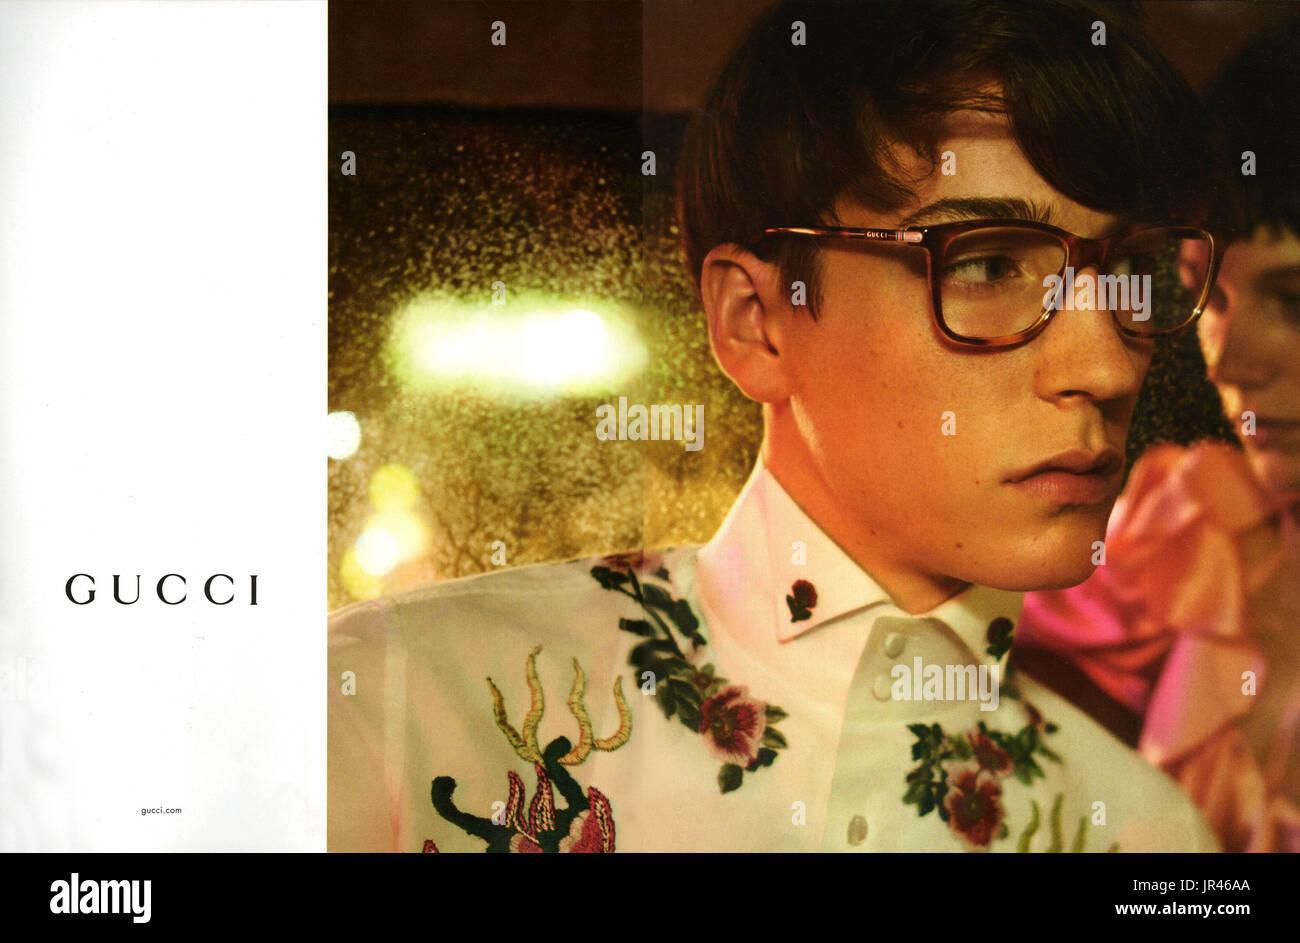 efc0b6e97401 2010er Jahre UK Gucci Magazin Anzeige Stockfoto, Bild  151912834 - Alamy